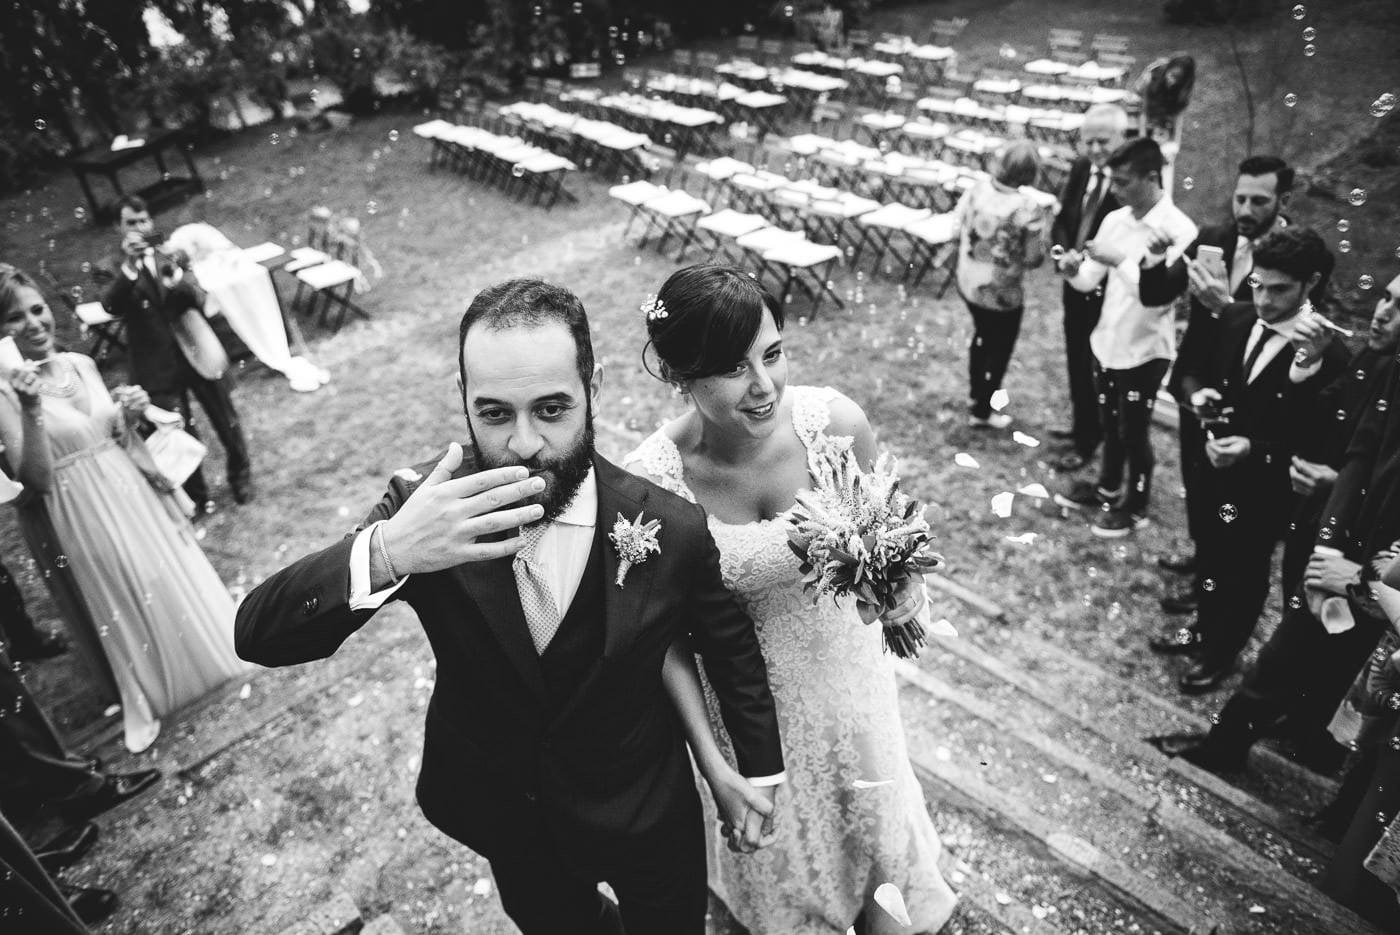 Matrimonio Giulia & Federico 09_15 – Alessio Nobili Photographer-37